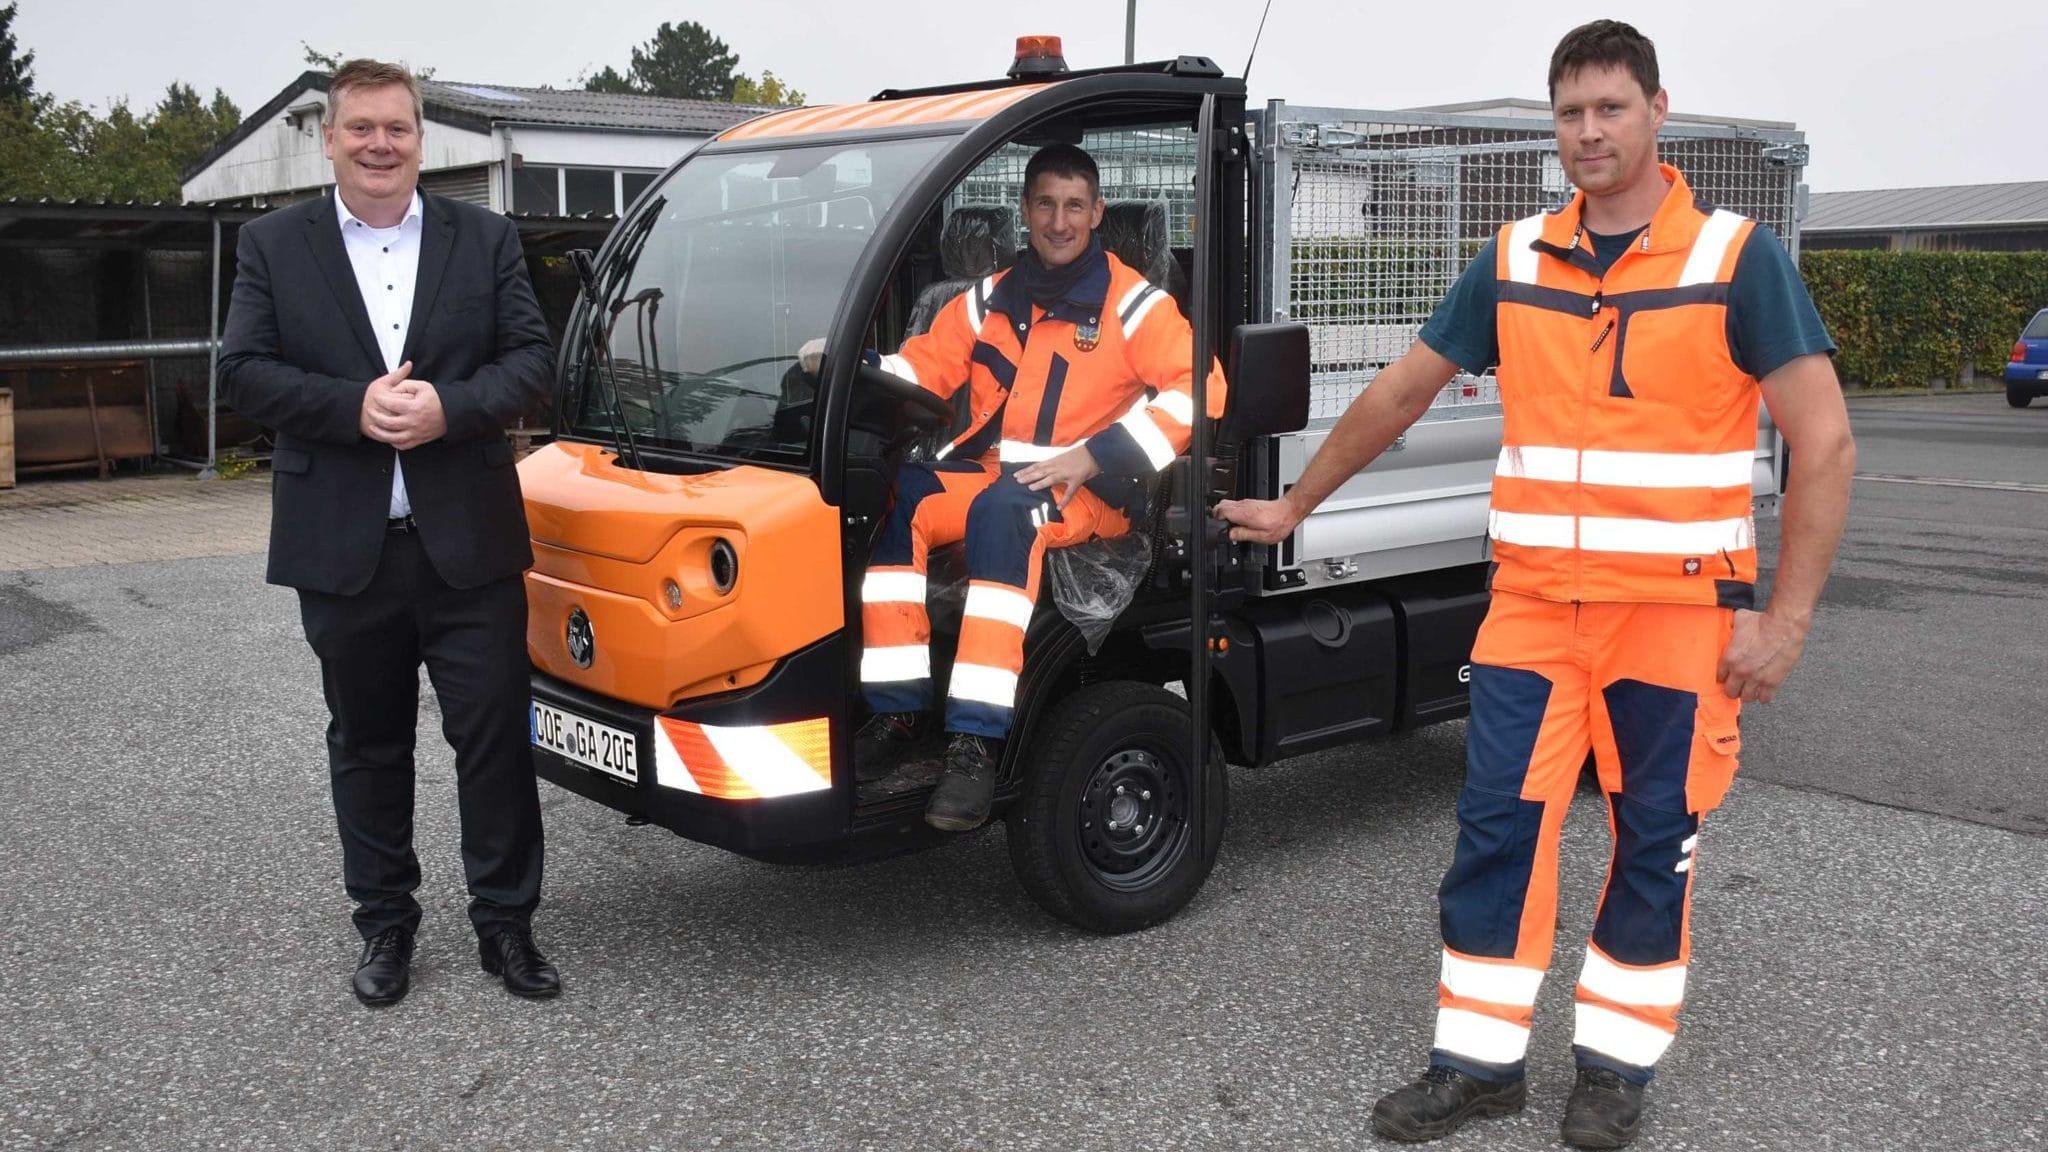 Bürgermeister übergibt E-Fahrzeug an Bauhofmitarbeiter